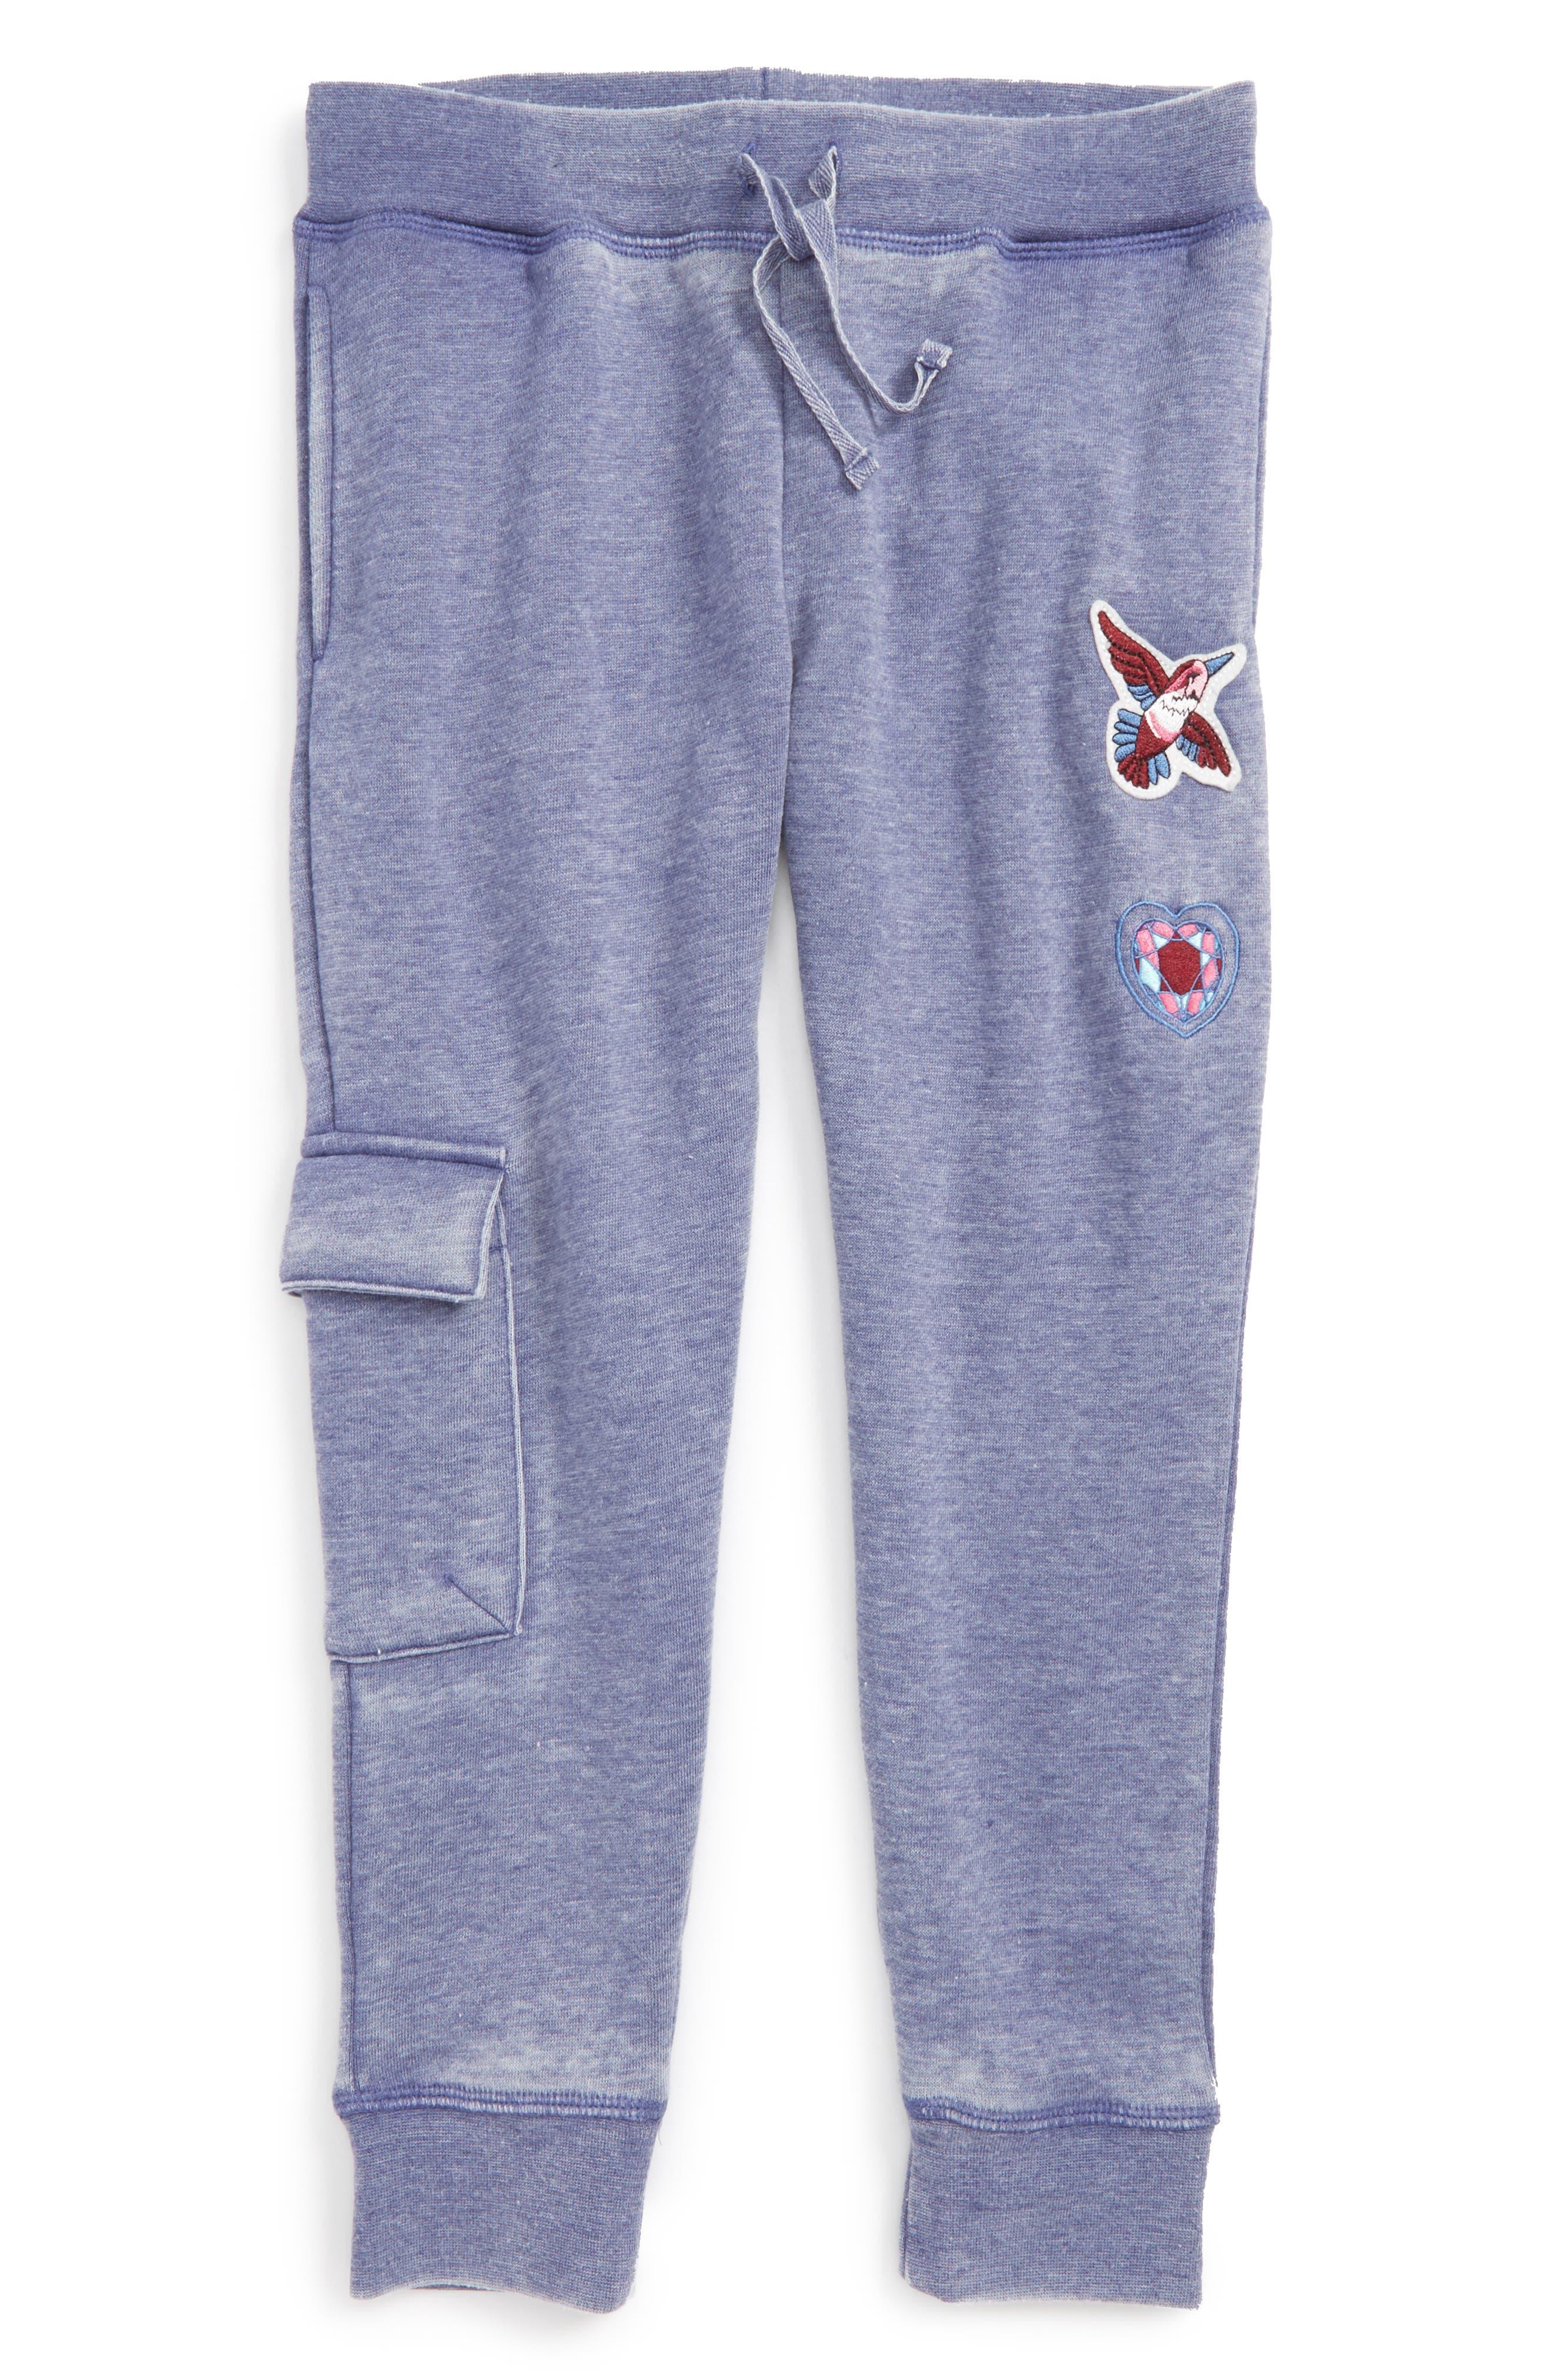 Main Image - C & C California Appliqué Jogger Pants (Big Girls)